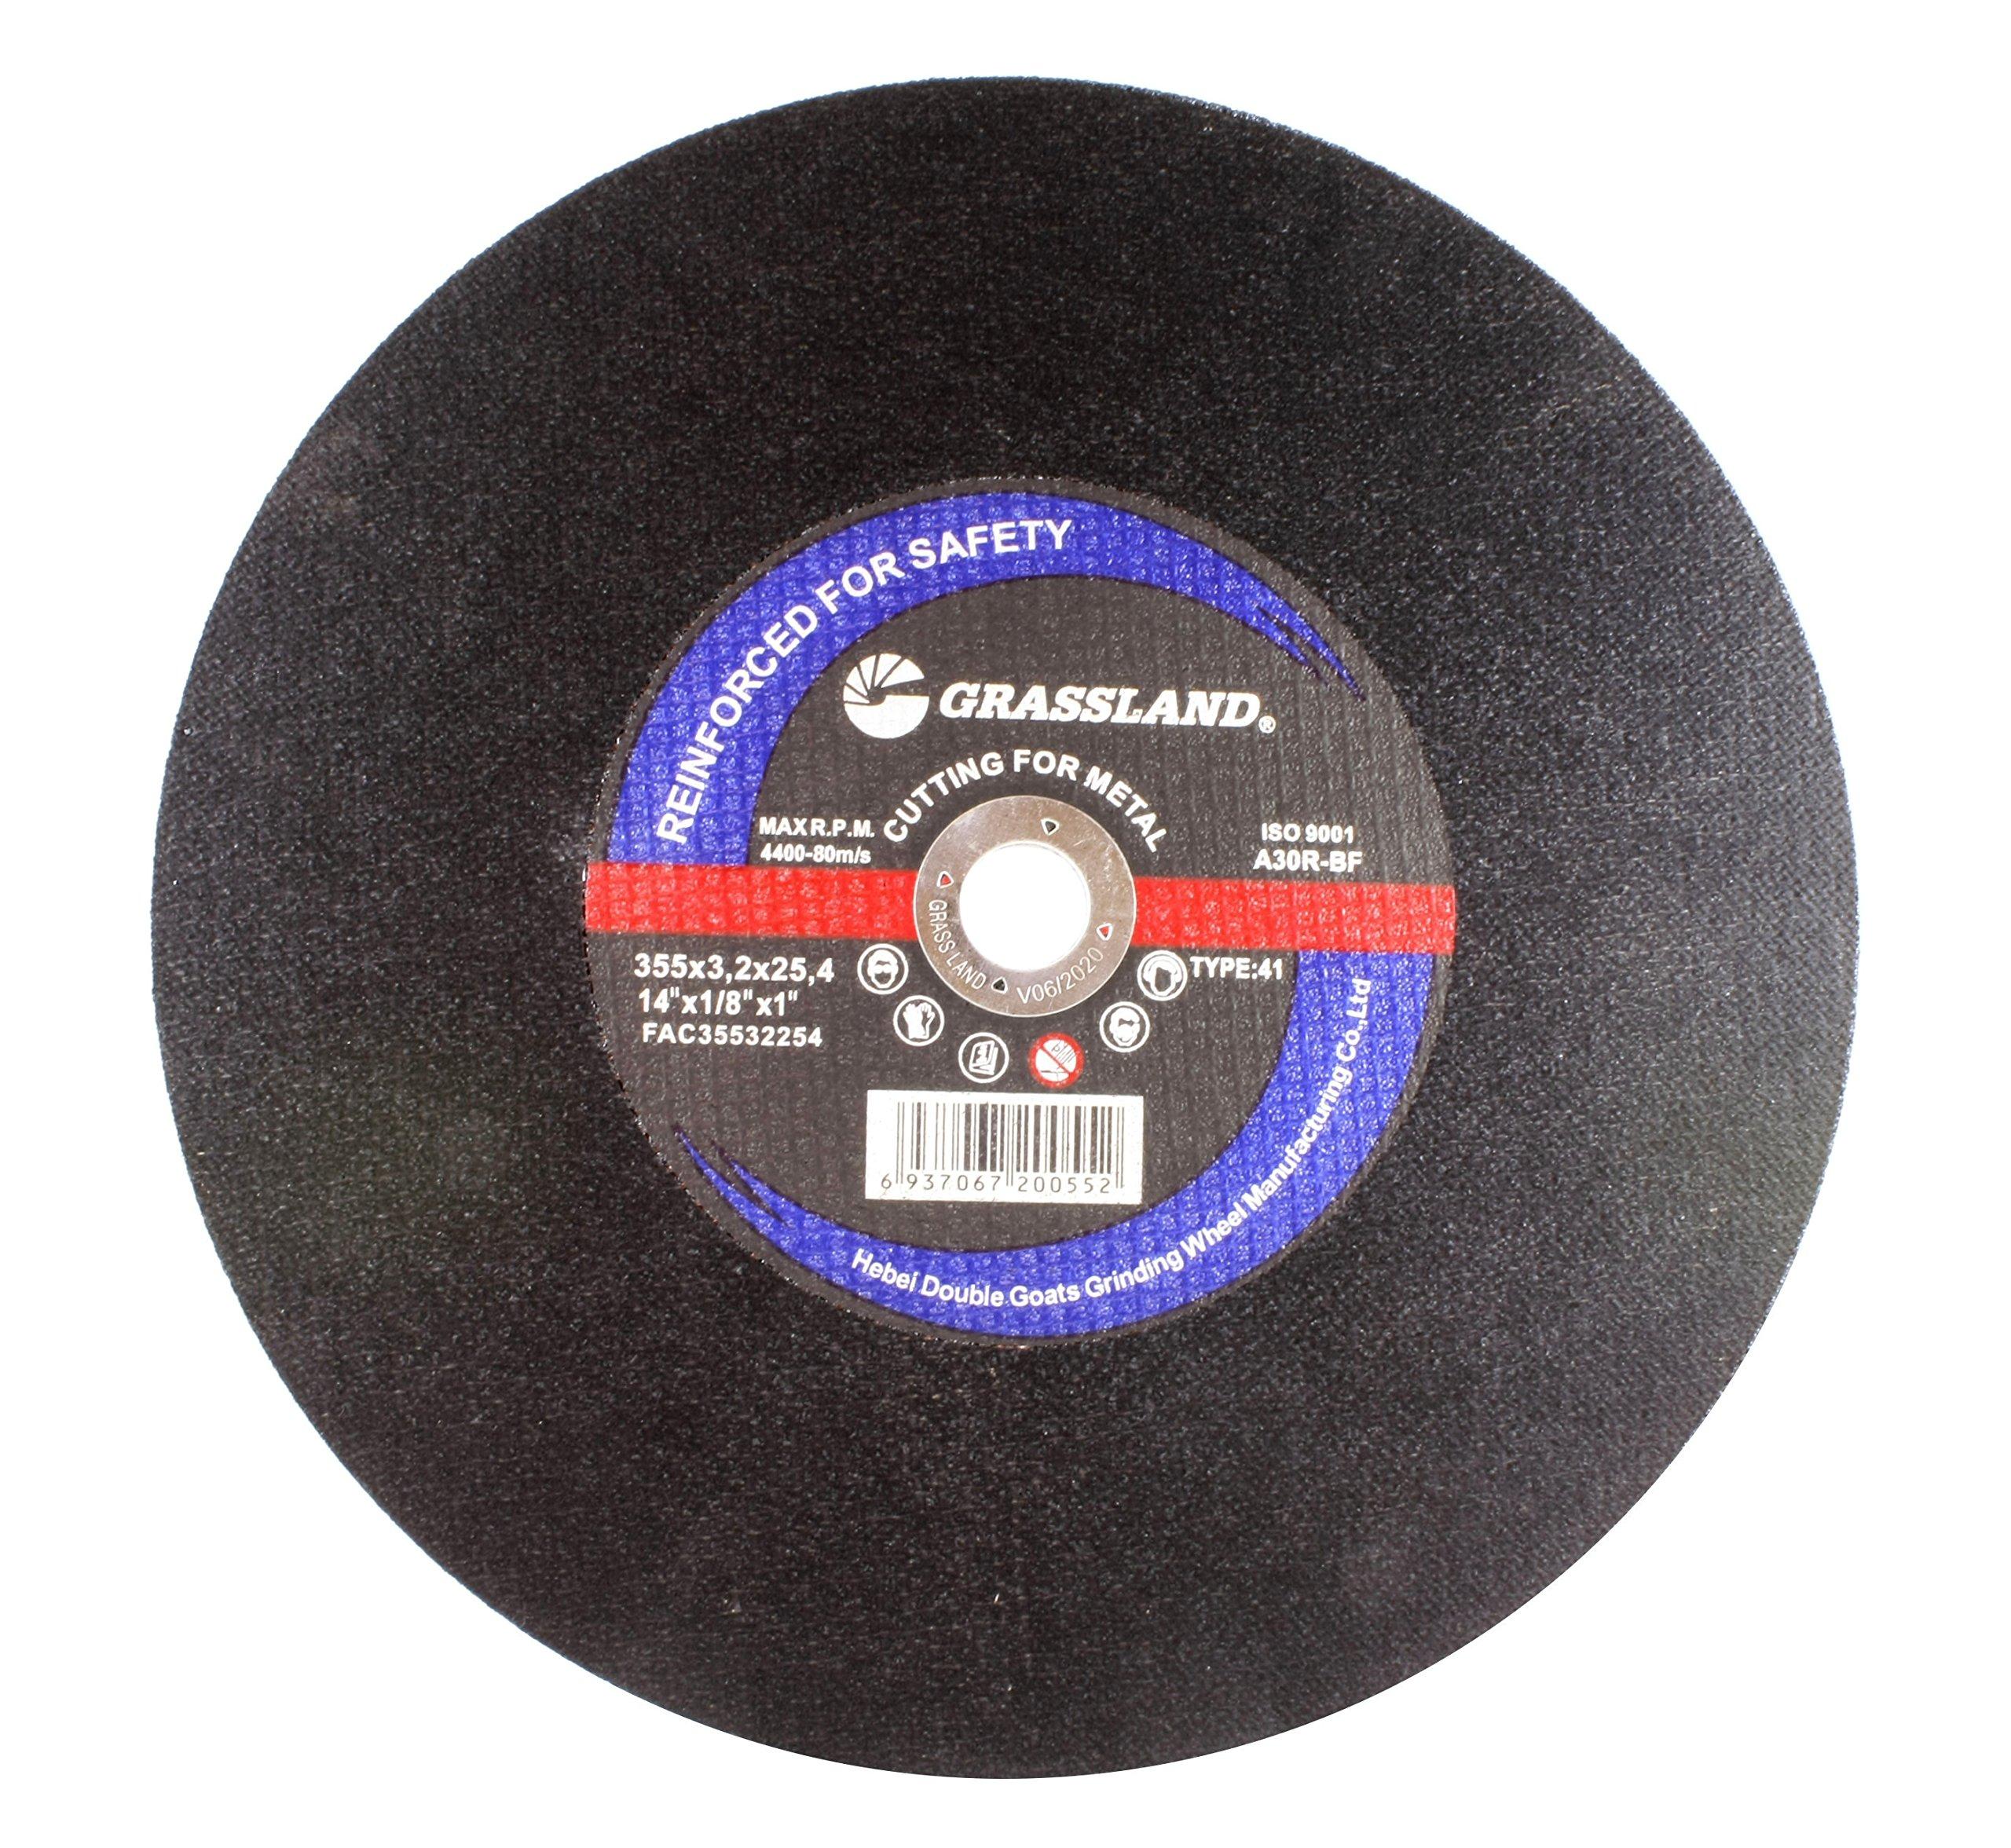 Cutting Disc, Steel Cut-off Wheel for Chop Saw - 14'' x 1/8'' x 1'' - T41 - (10 PACK)